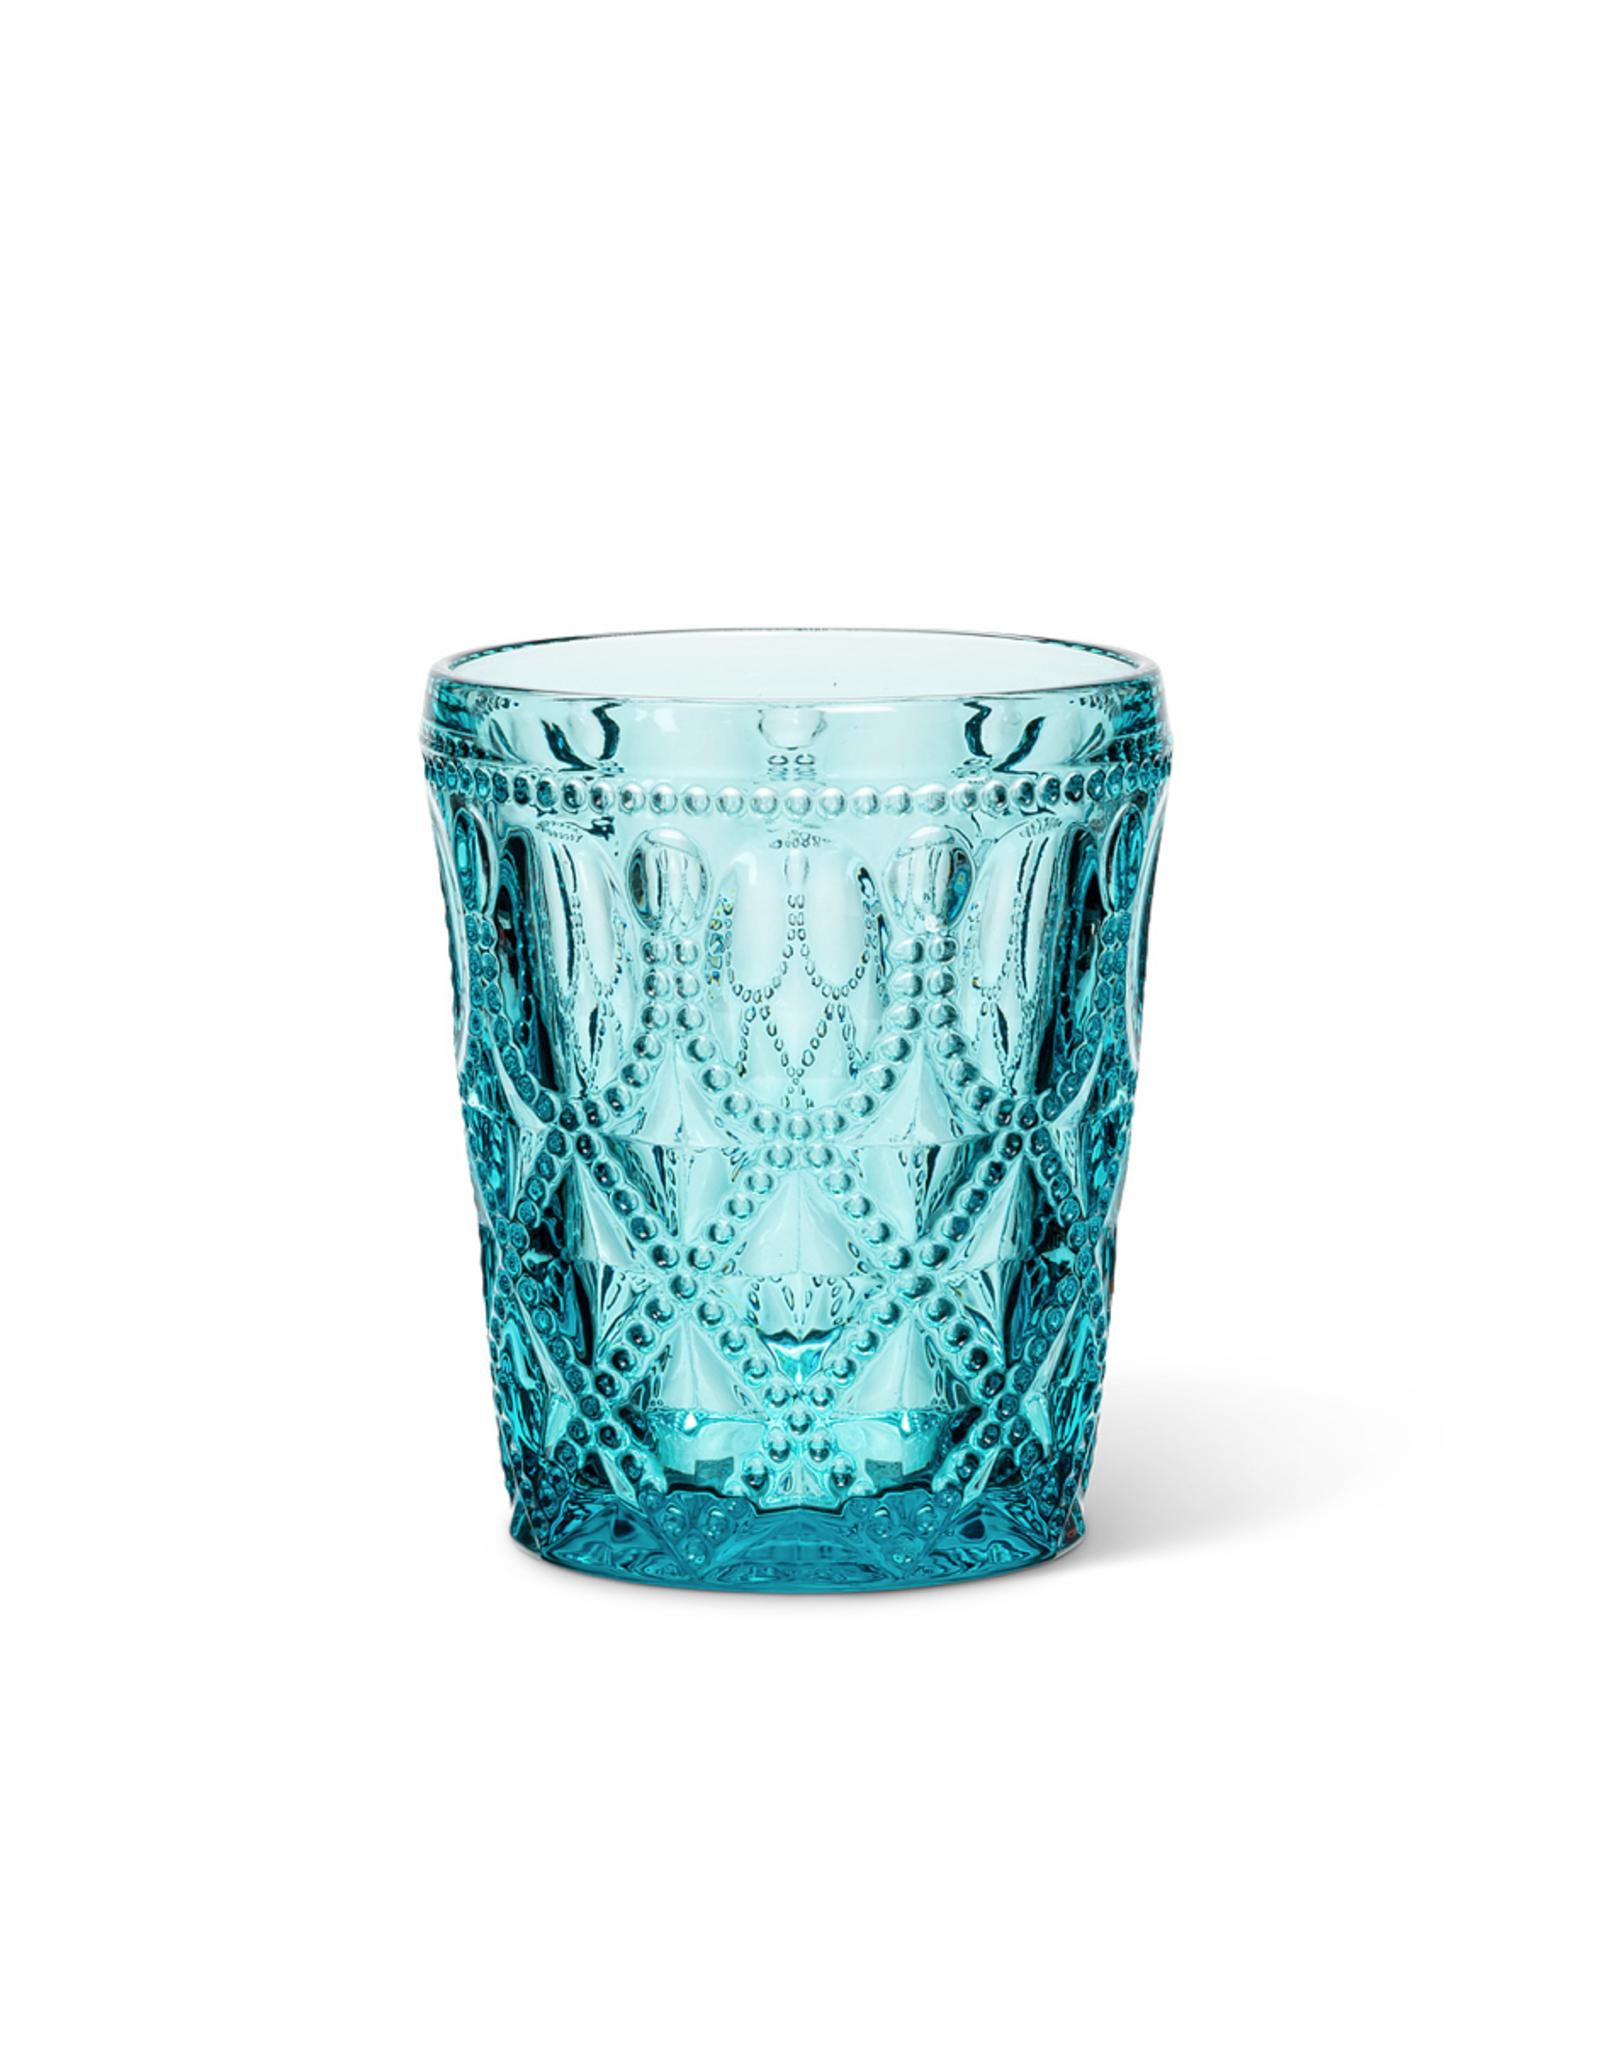 ATT - Tumbler Glass / Jewel, Turquoise, 12oz